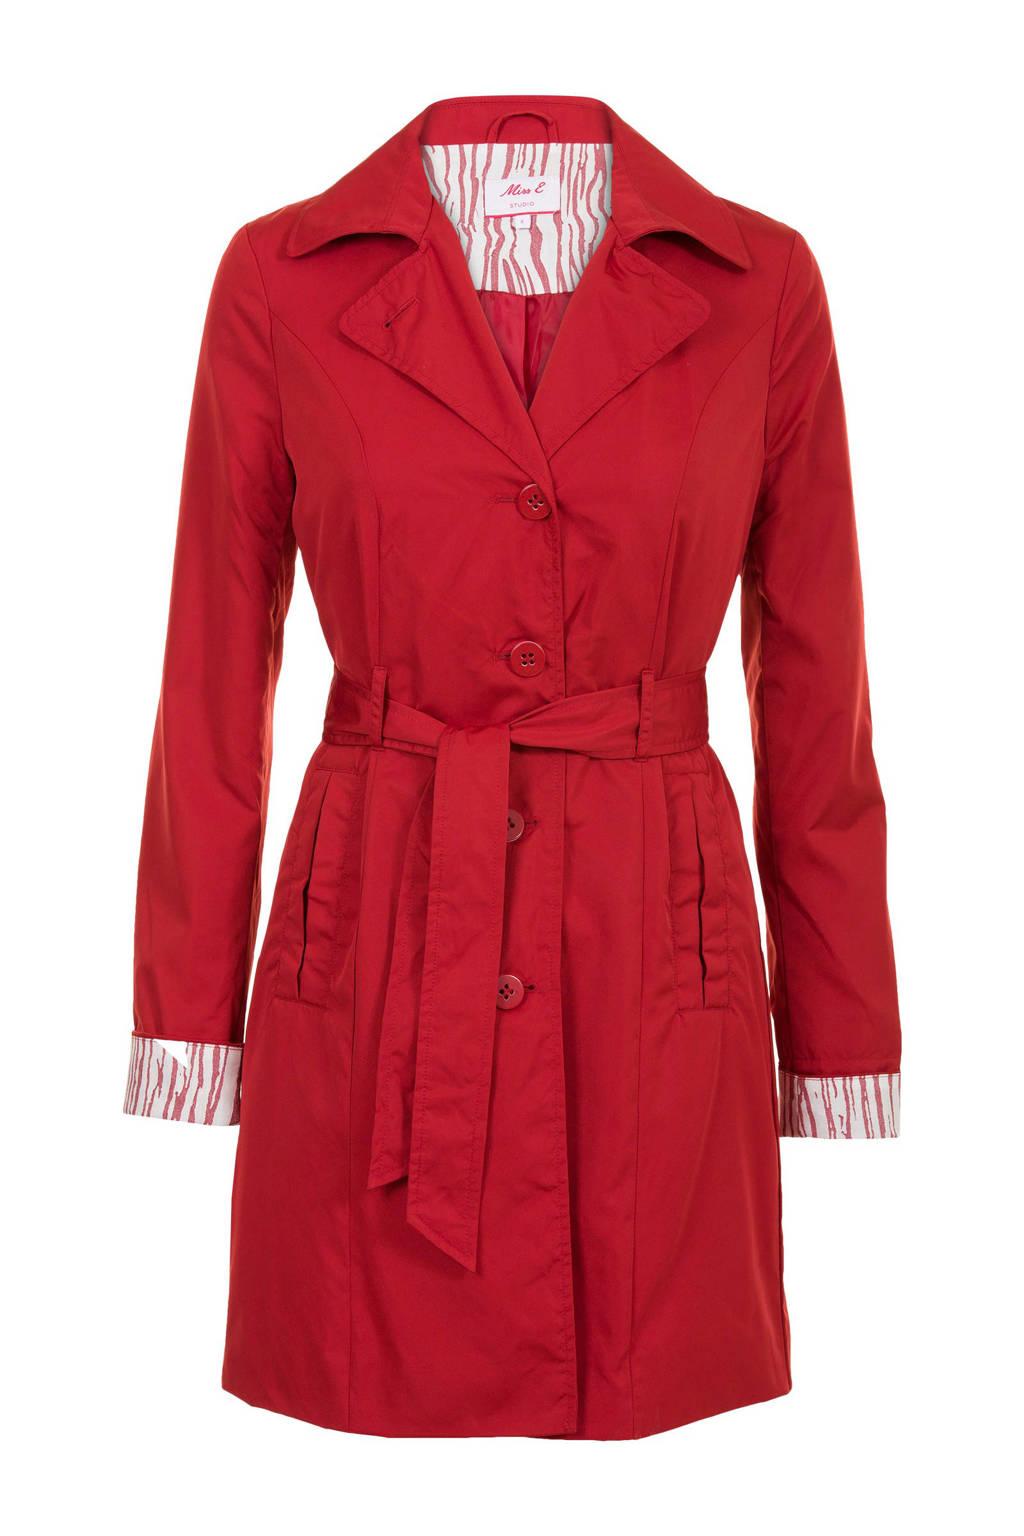 Miss Etam Regulier trenchcoat rood, Rood